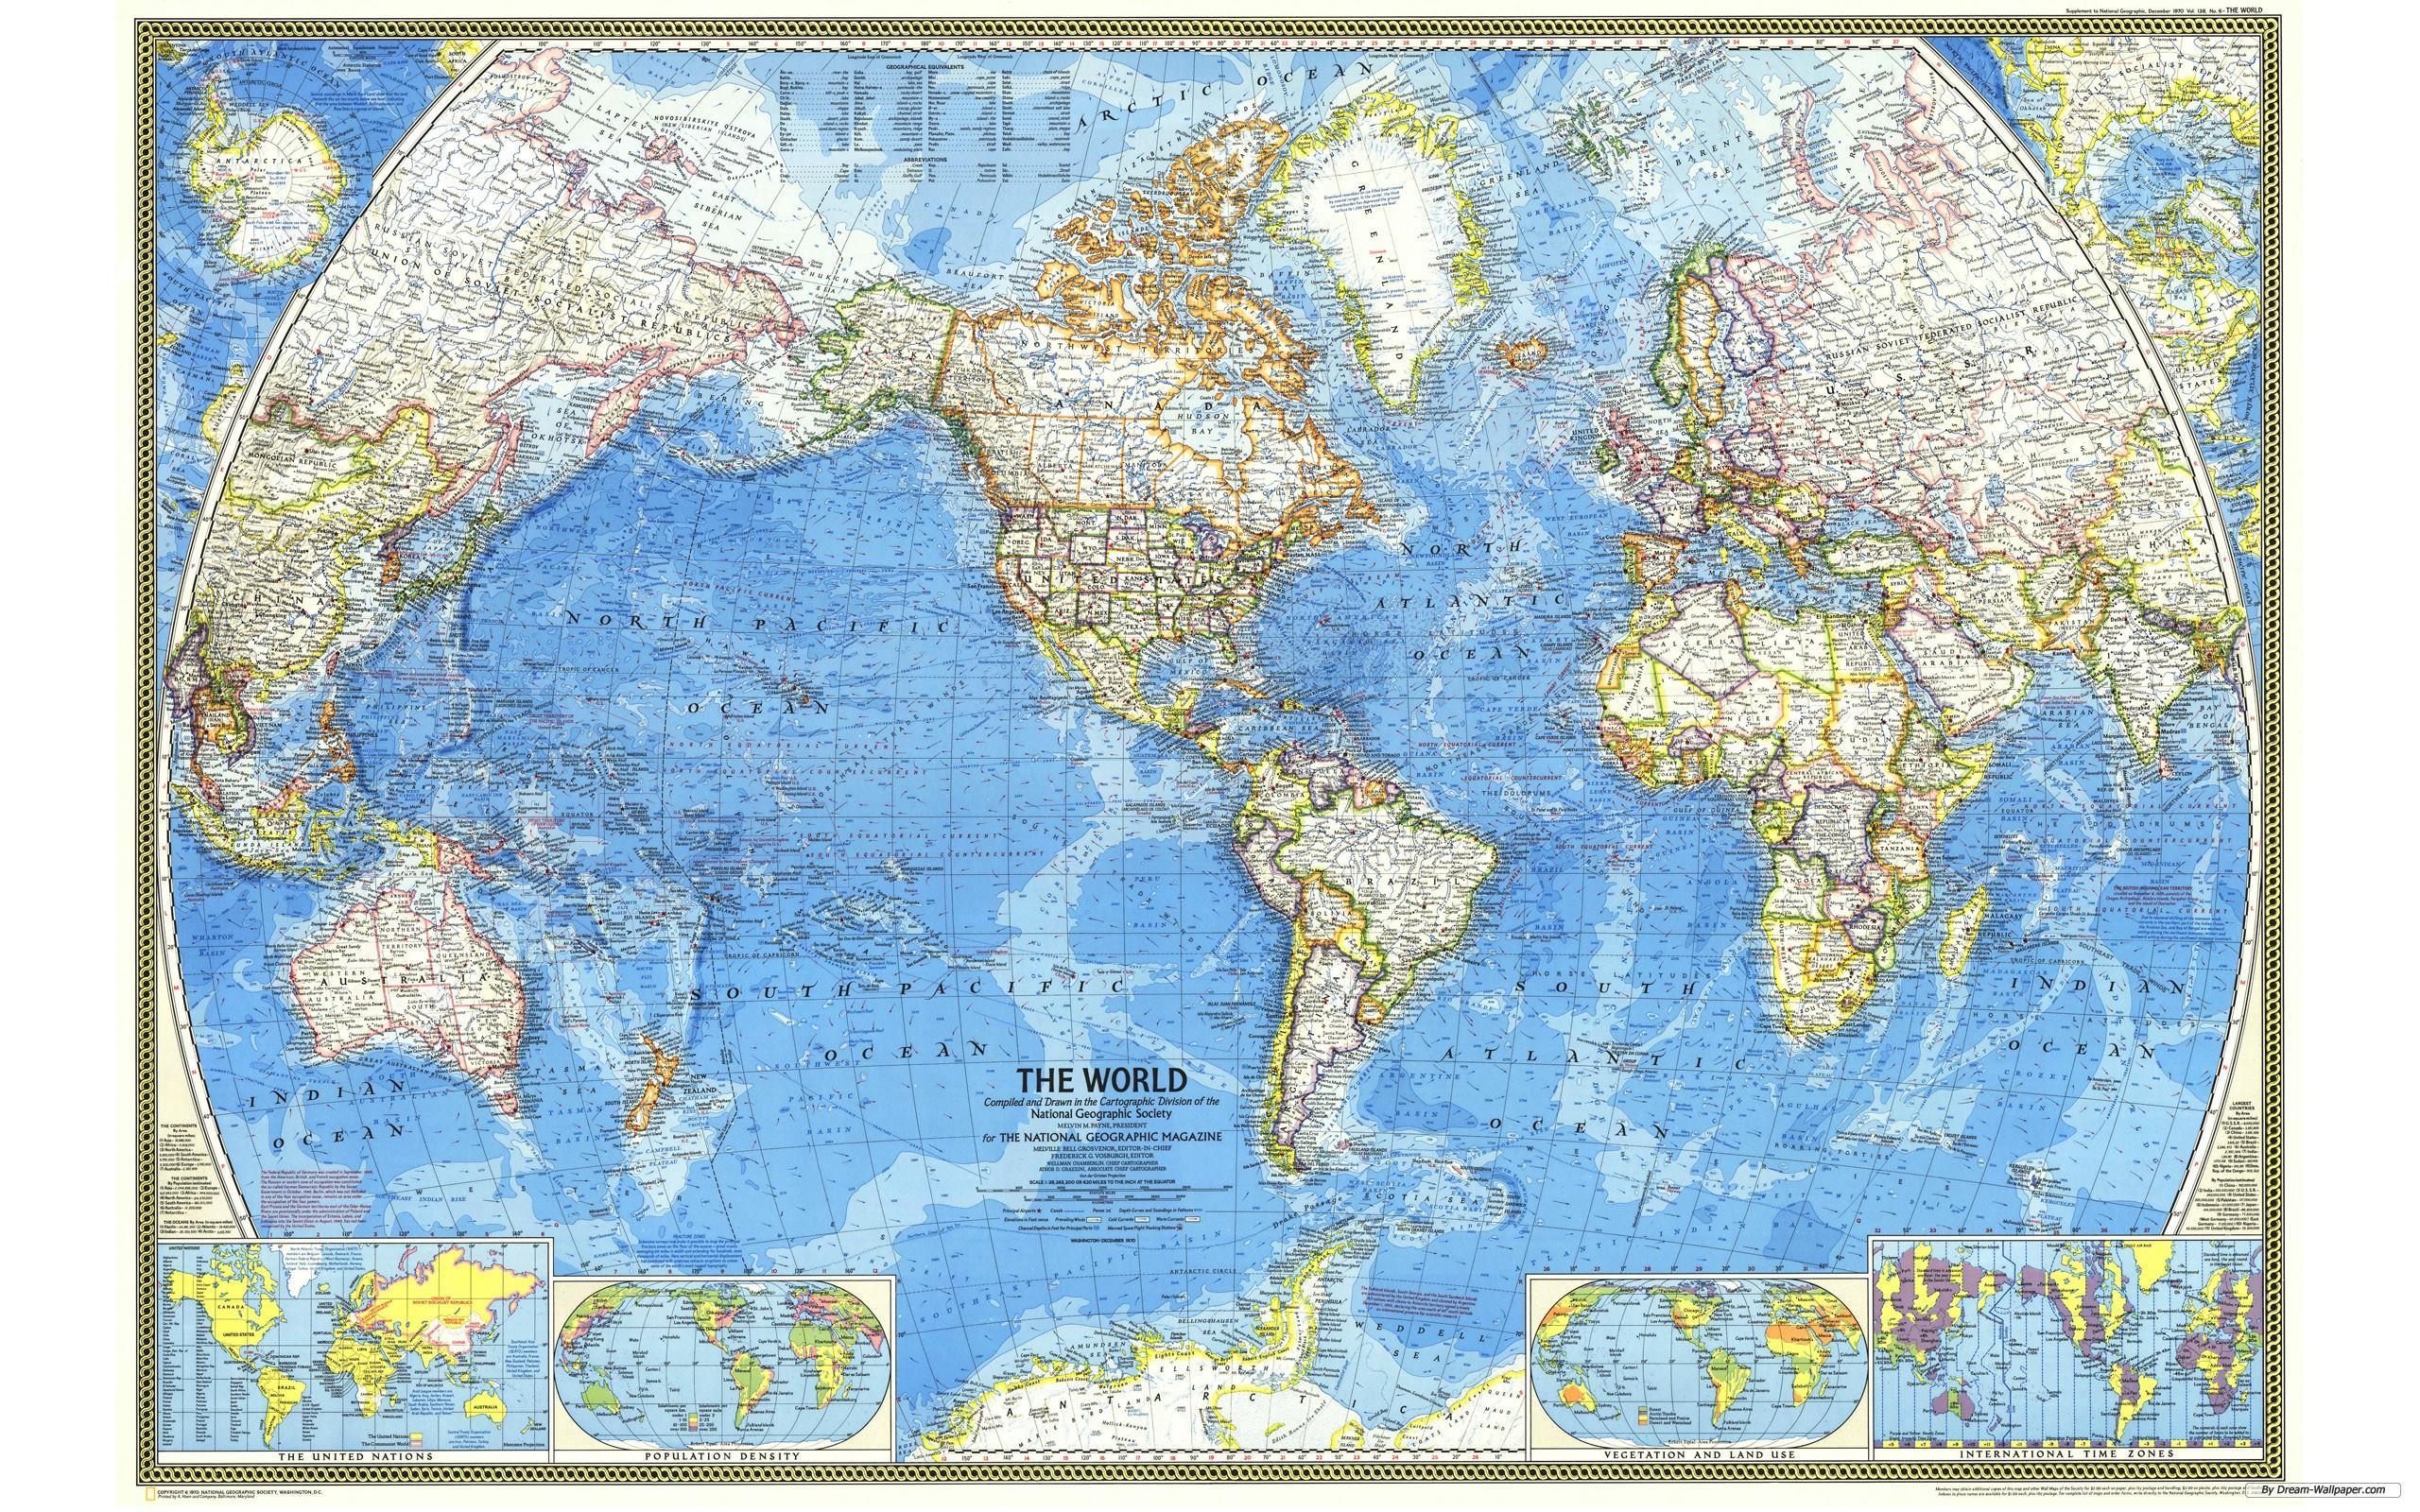 Travel wallpaper   World Map wallpaper   2560x1600 wallpaper   Index 7 2560x1600